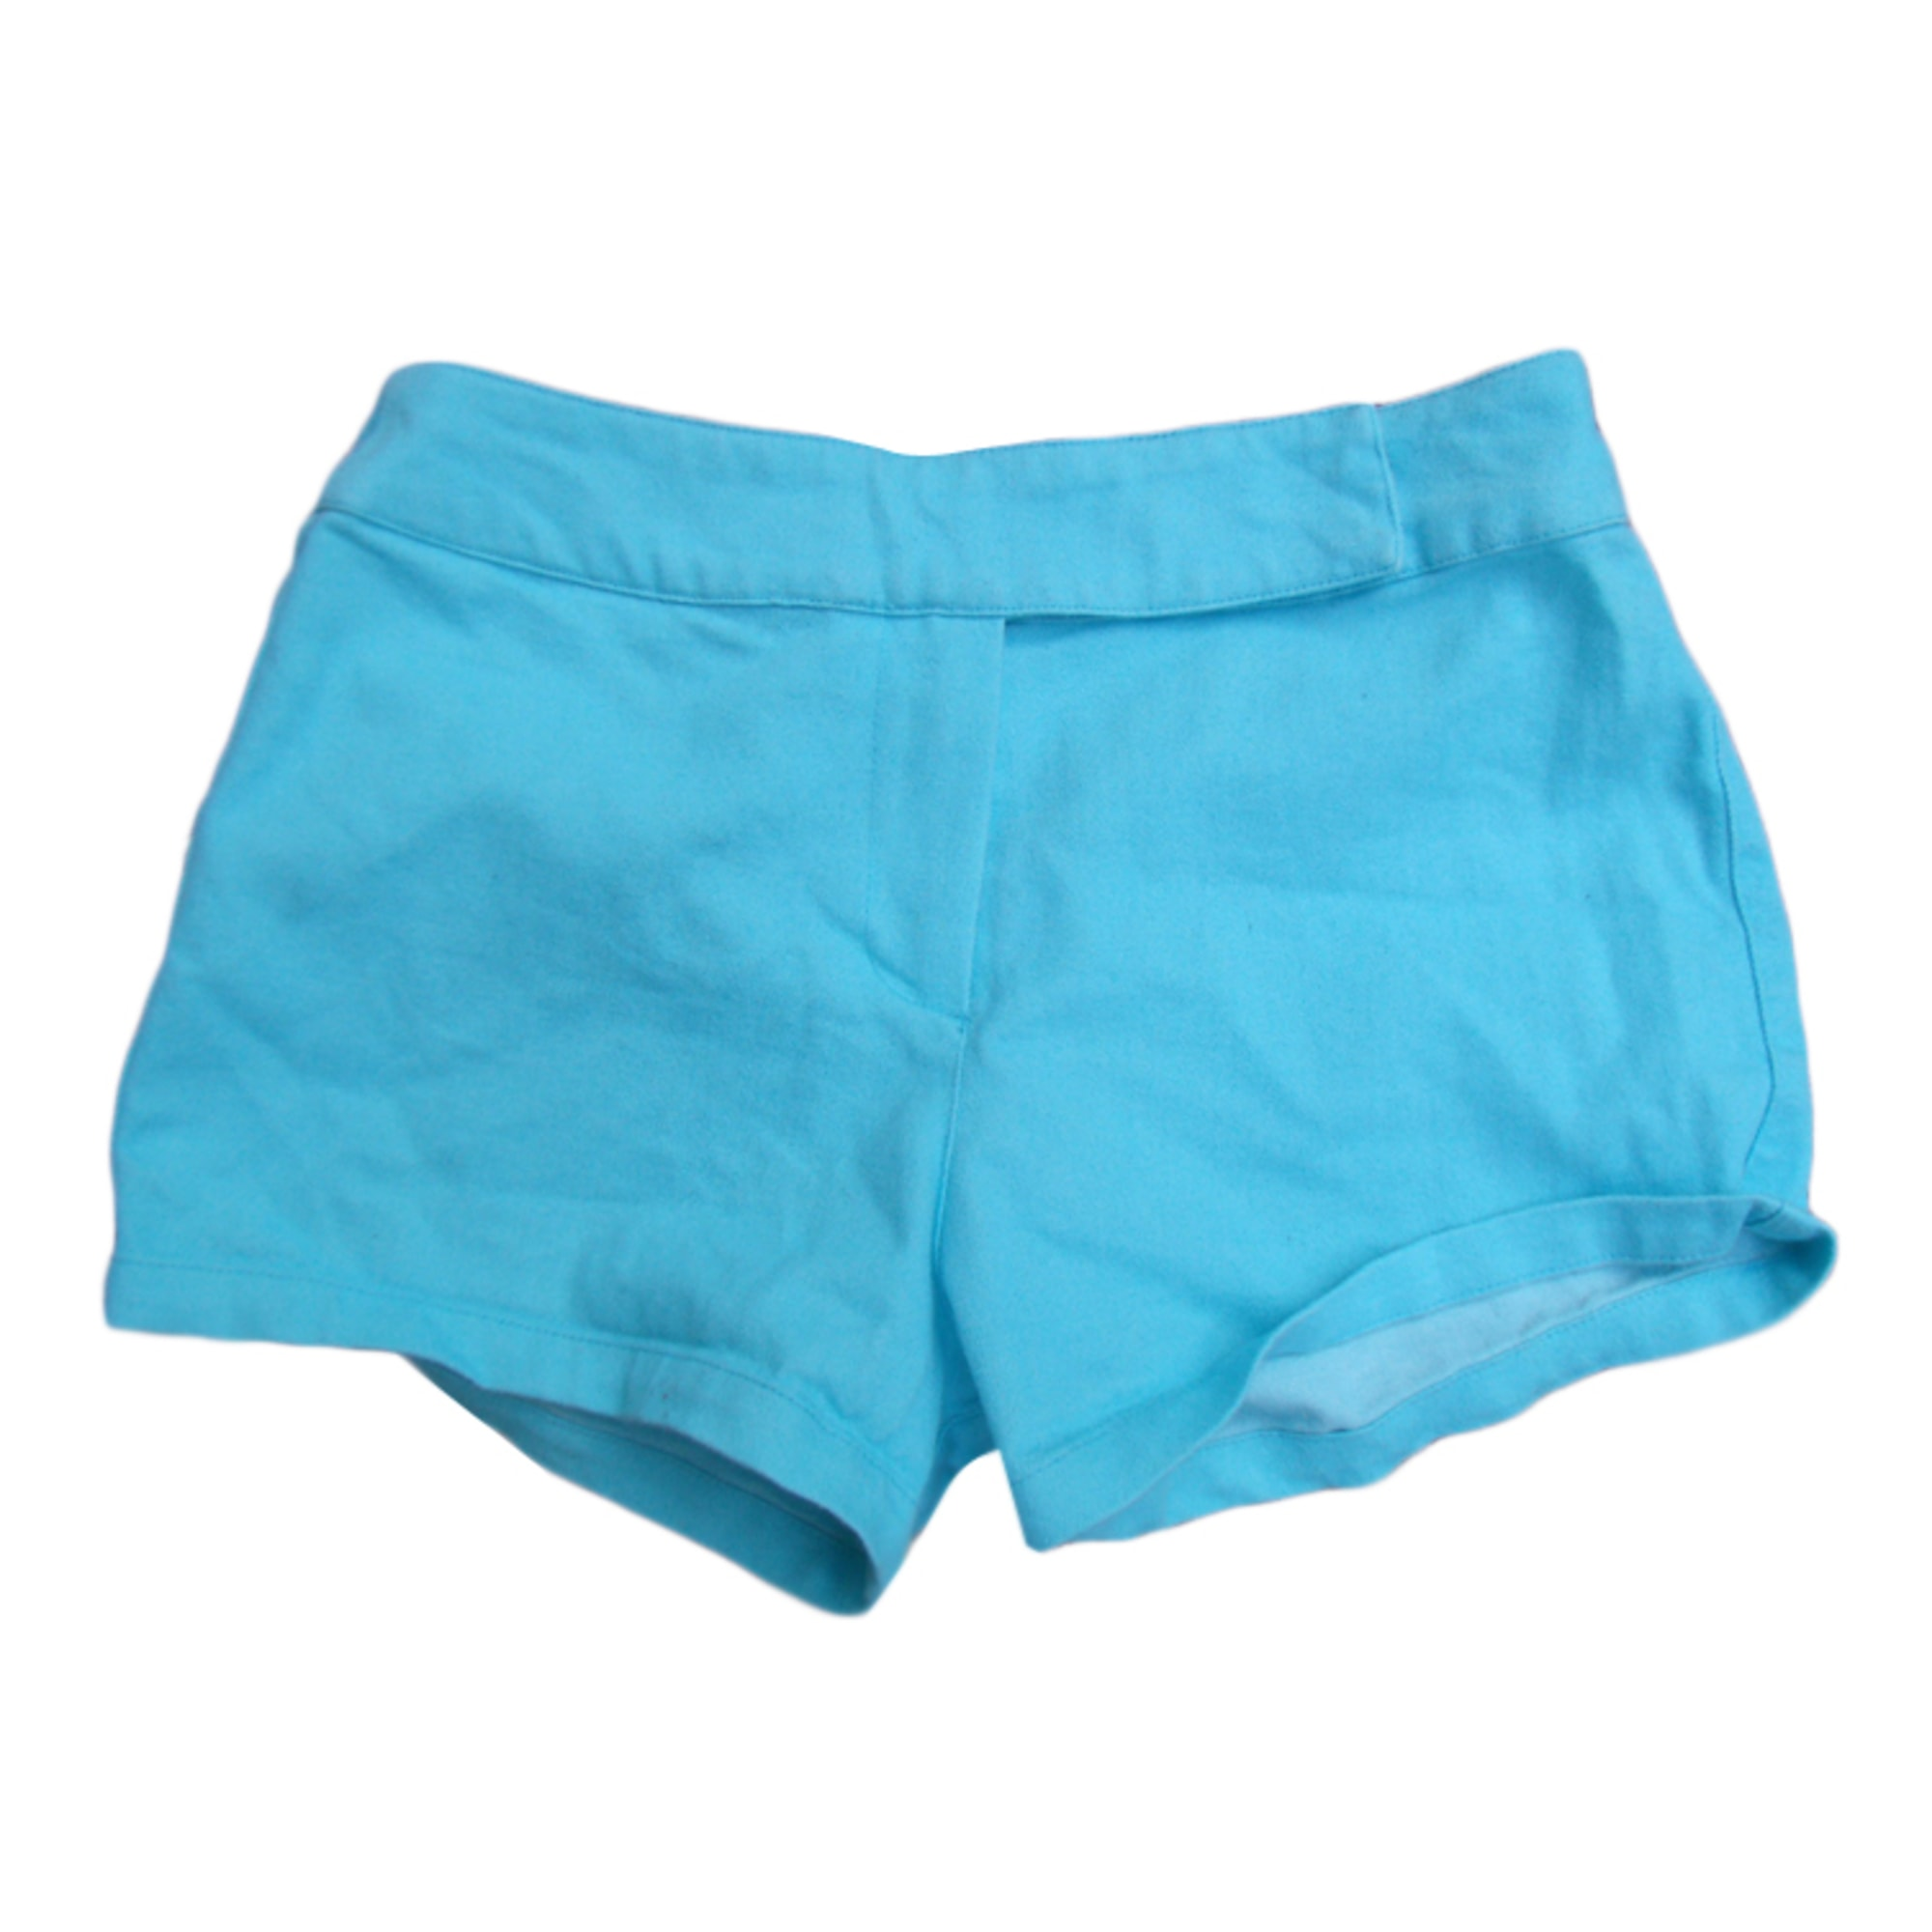 Short PROMOD Bleu, bleu marine, bleu turquoise